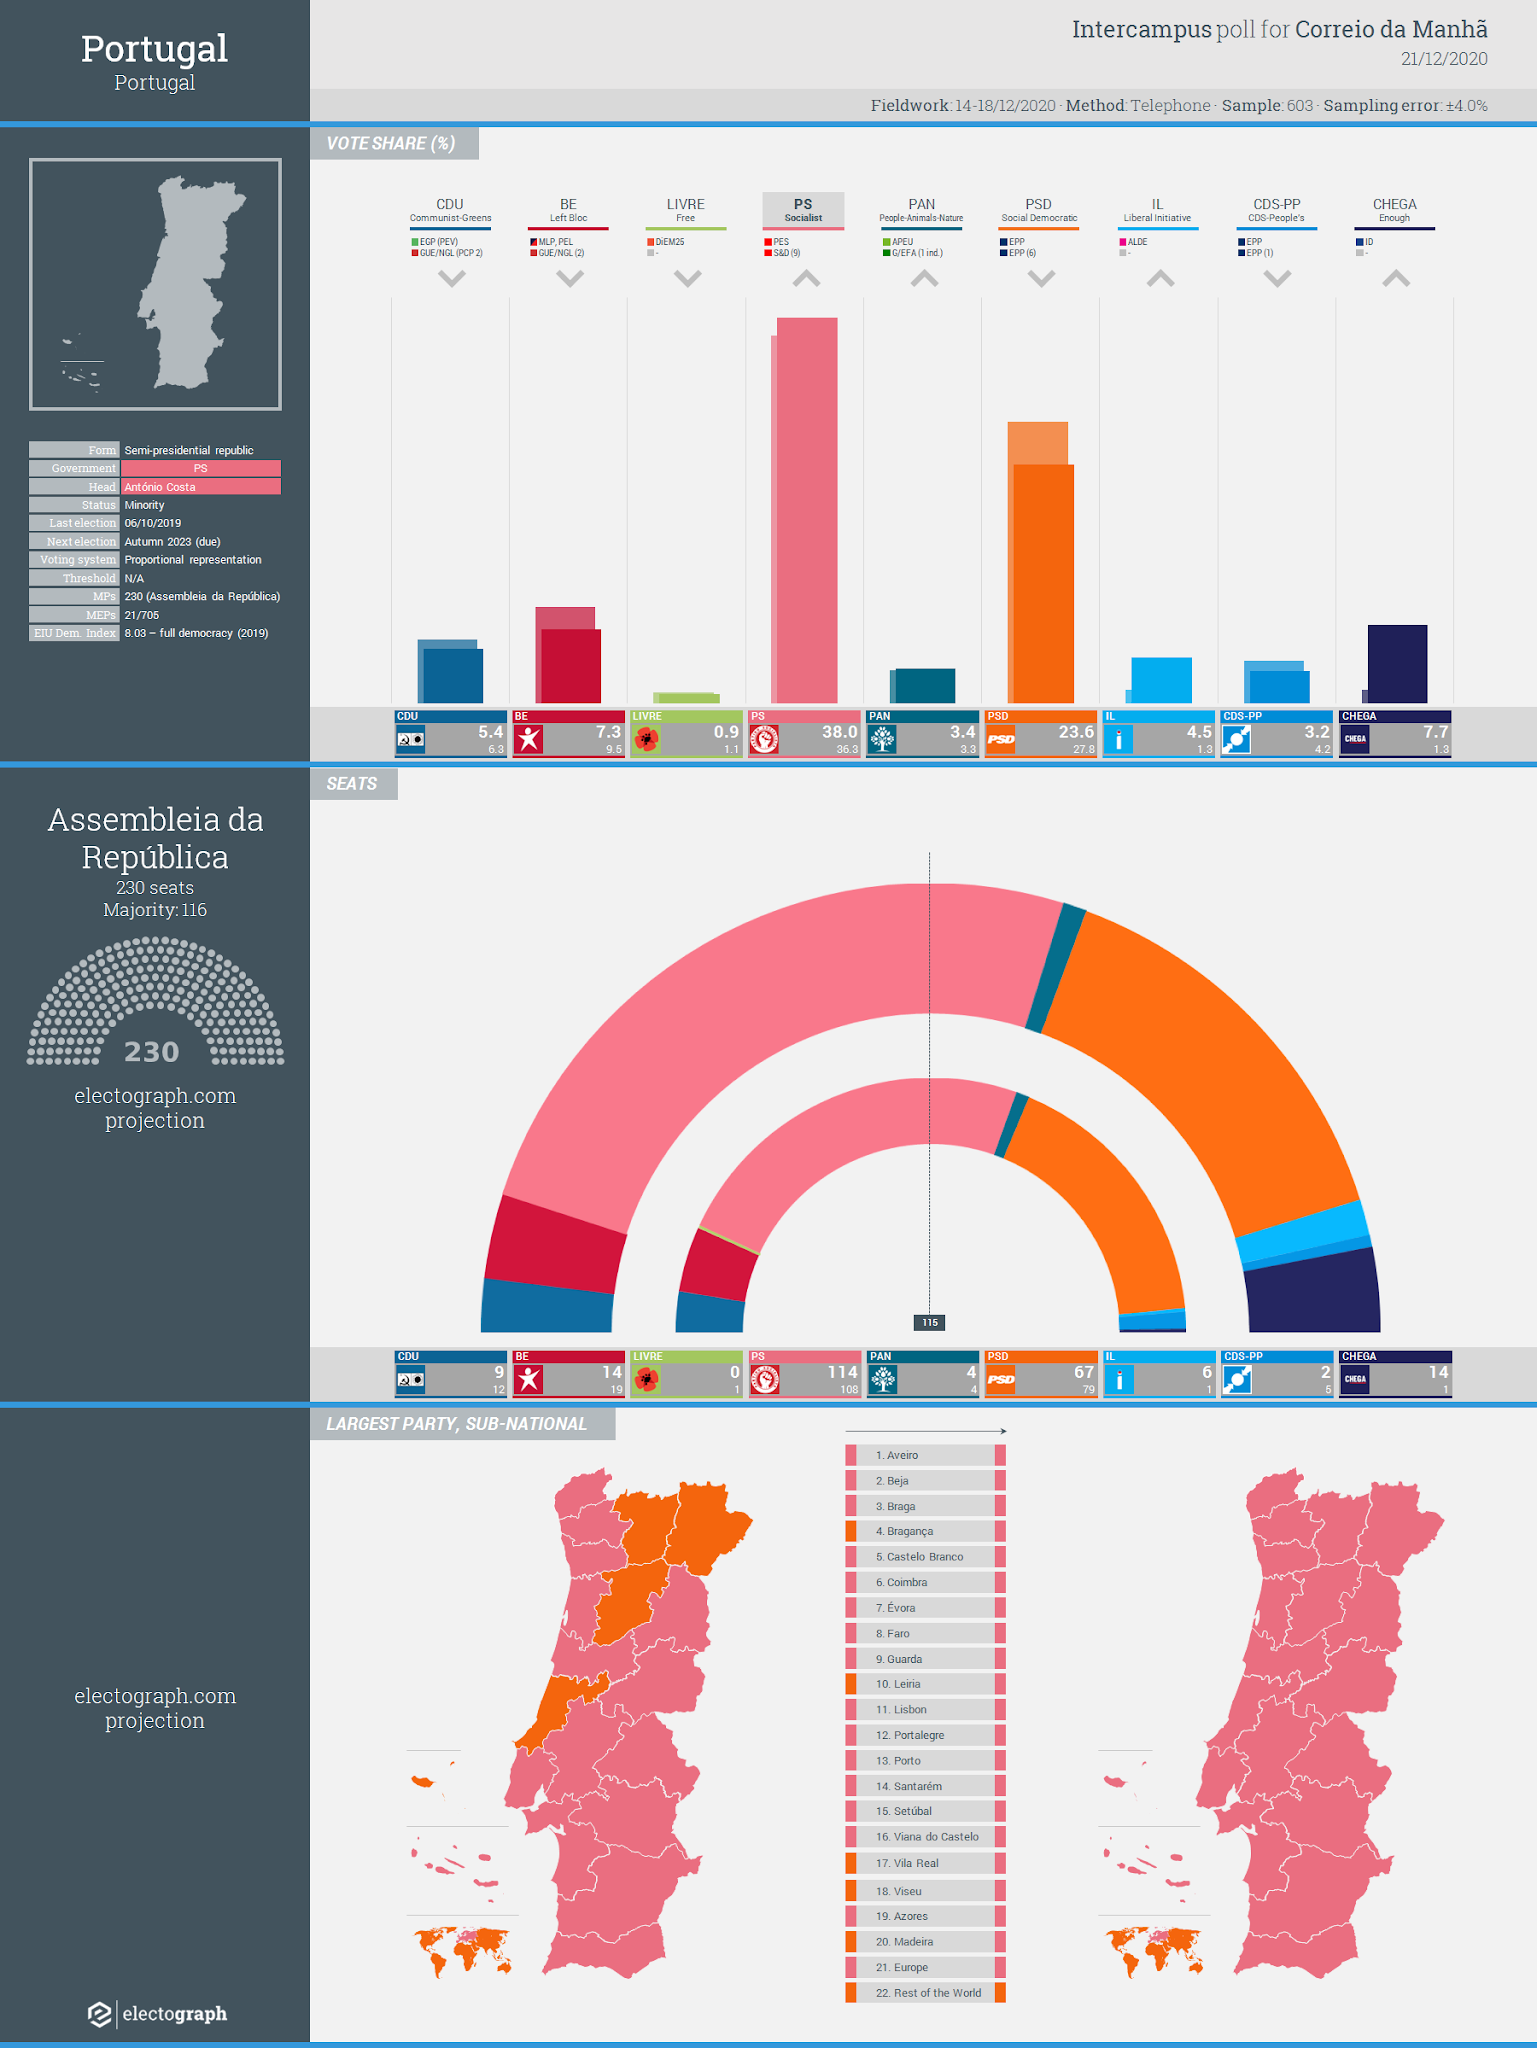 PORTUGAL: Intercampus poll chart for Correio da Manhã, 21 December 2020